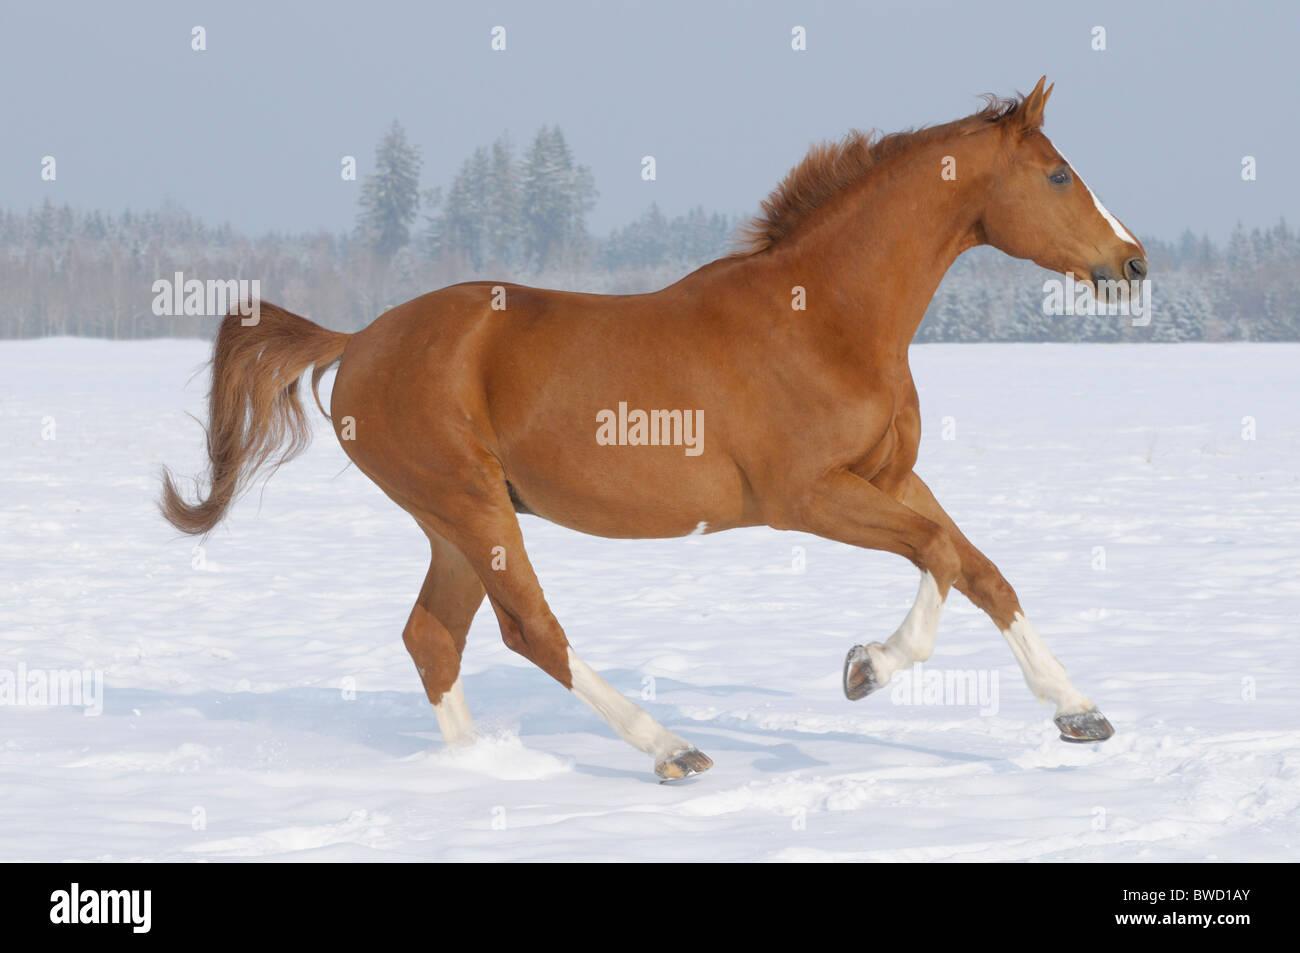 German warmblood horse galloping in the winter paddock - Stock Image